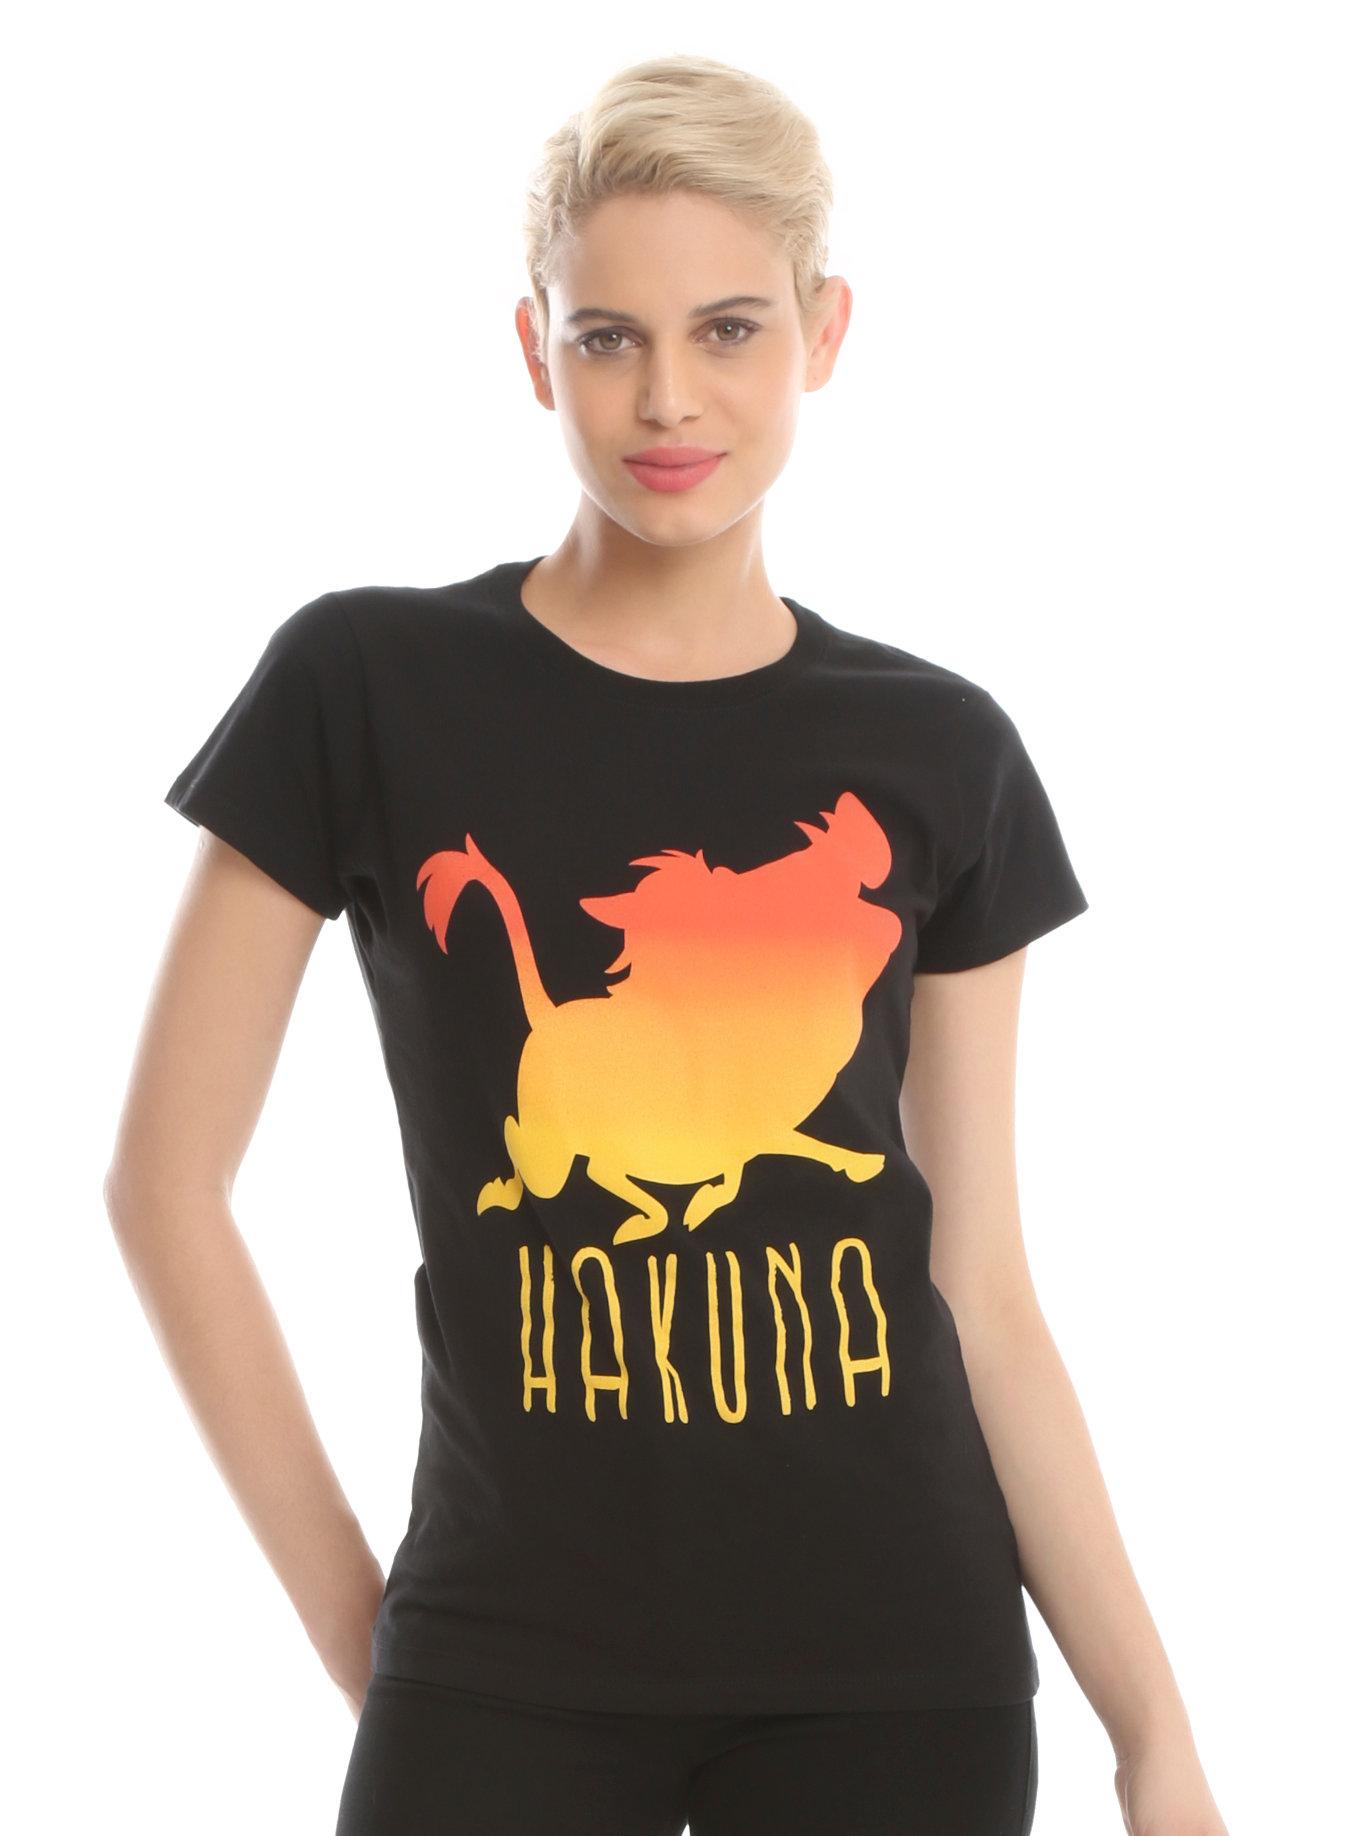 DISNEY THE LION KING HAKUNA SILHOUETTE GIRLS T-SHIR tee